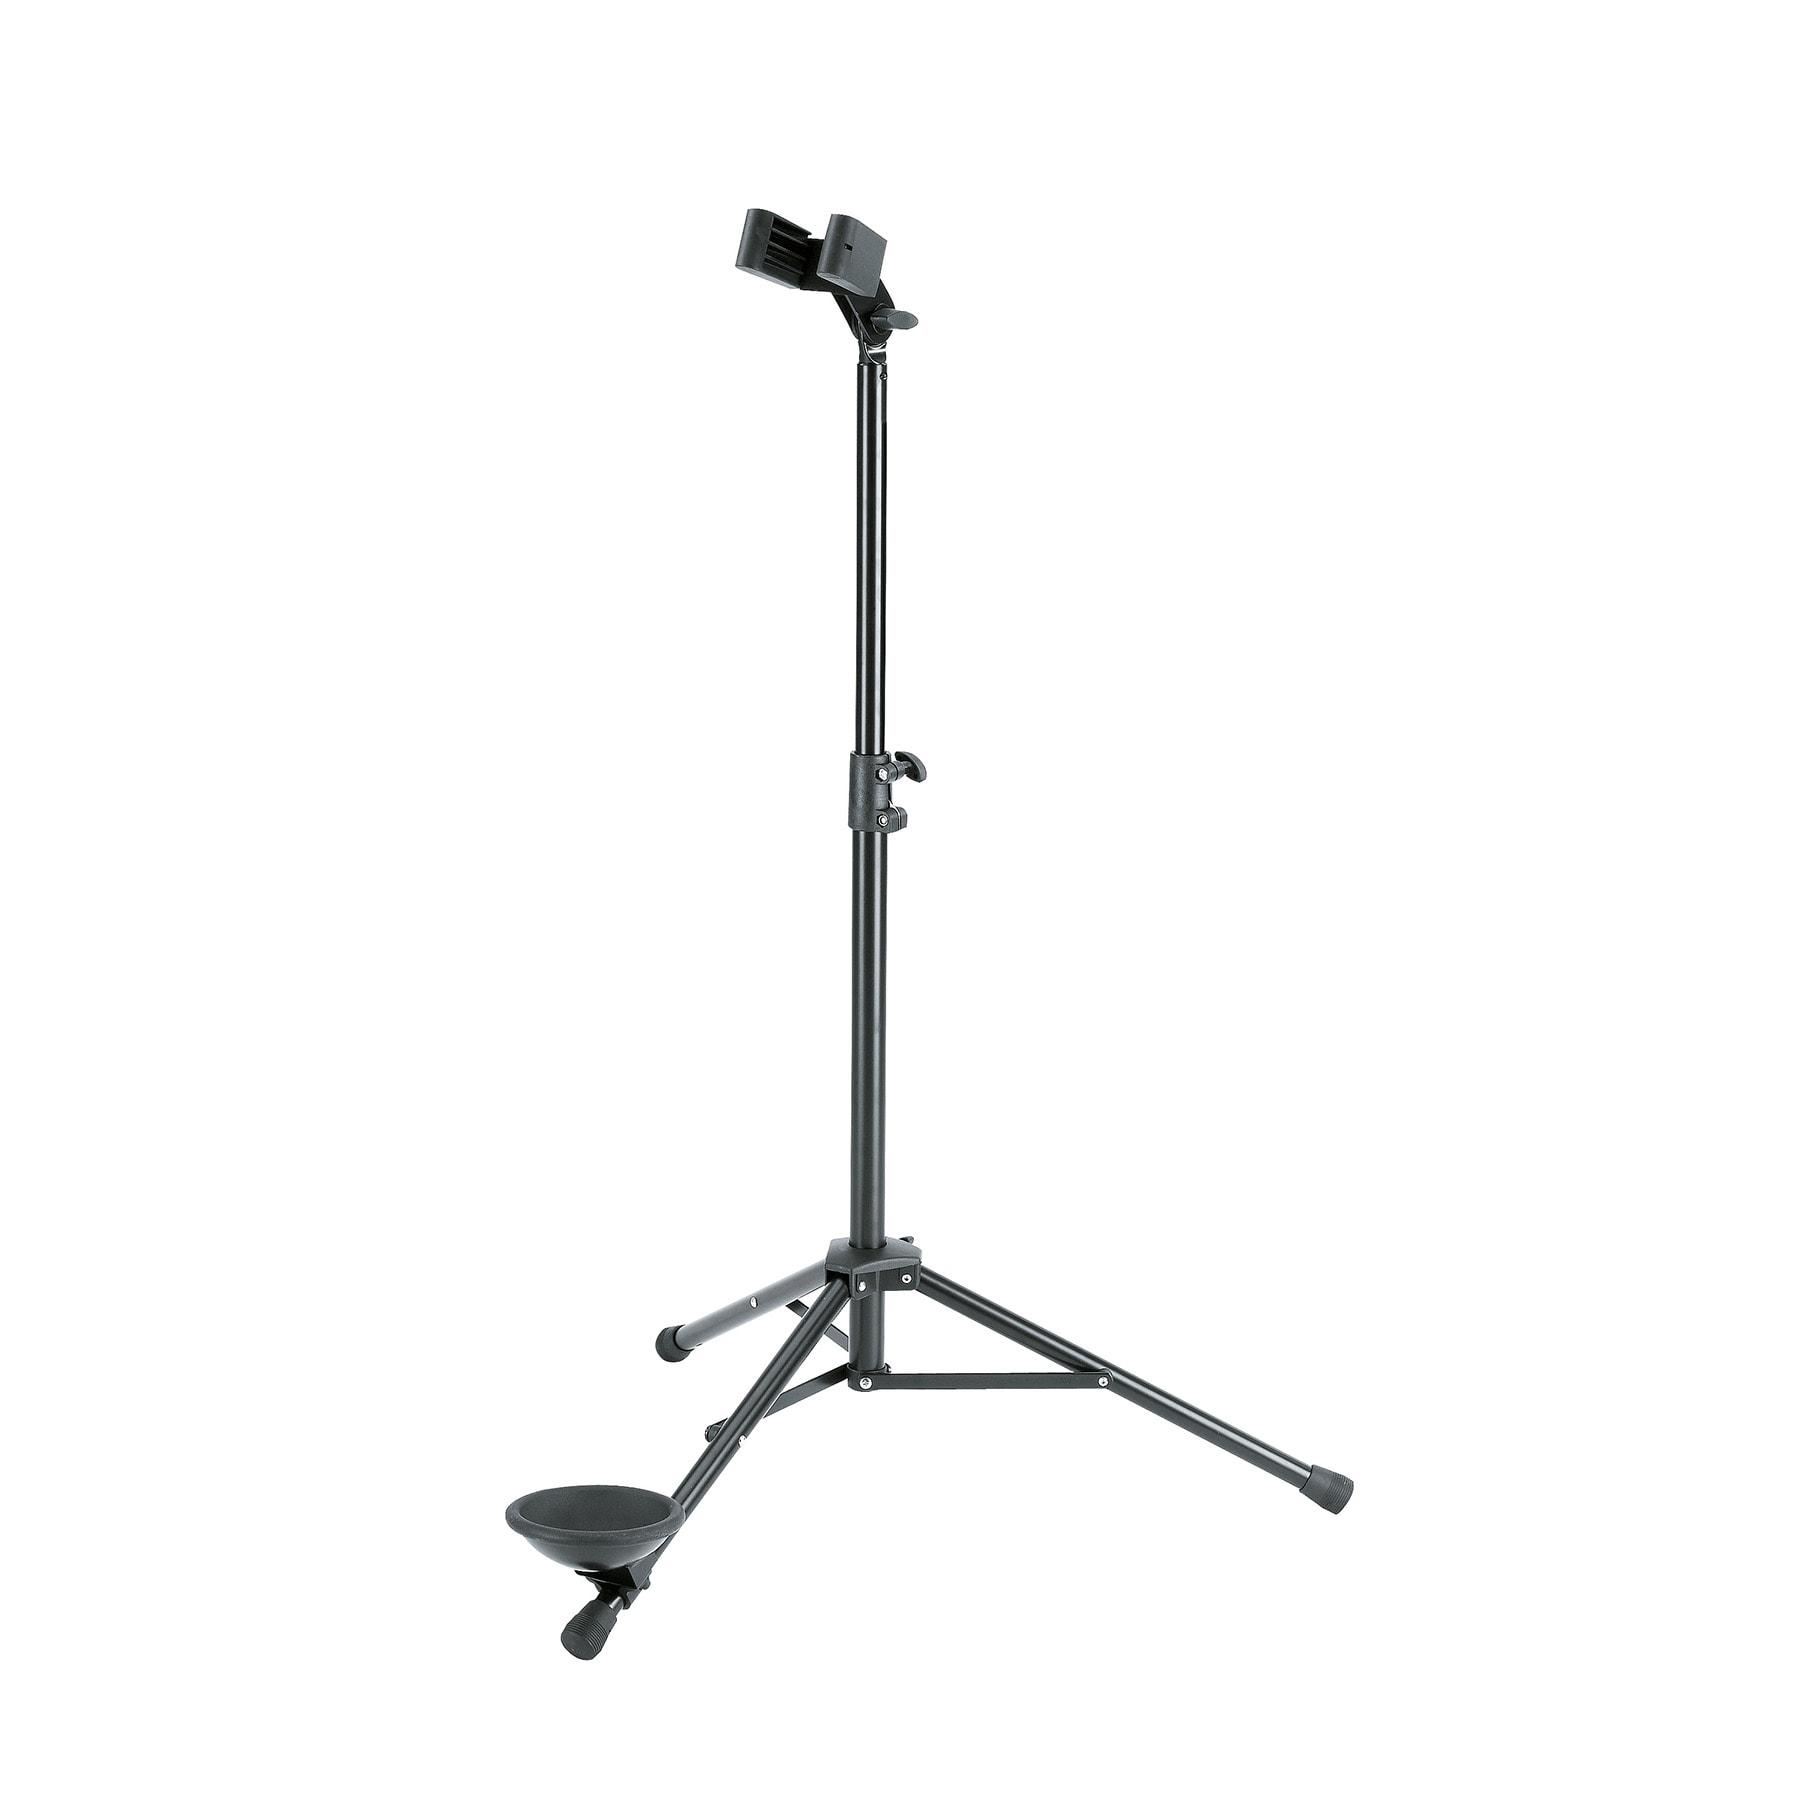 KM150_1 - Bassoon stand